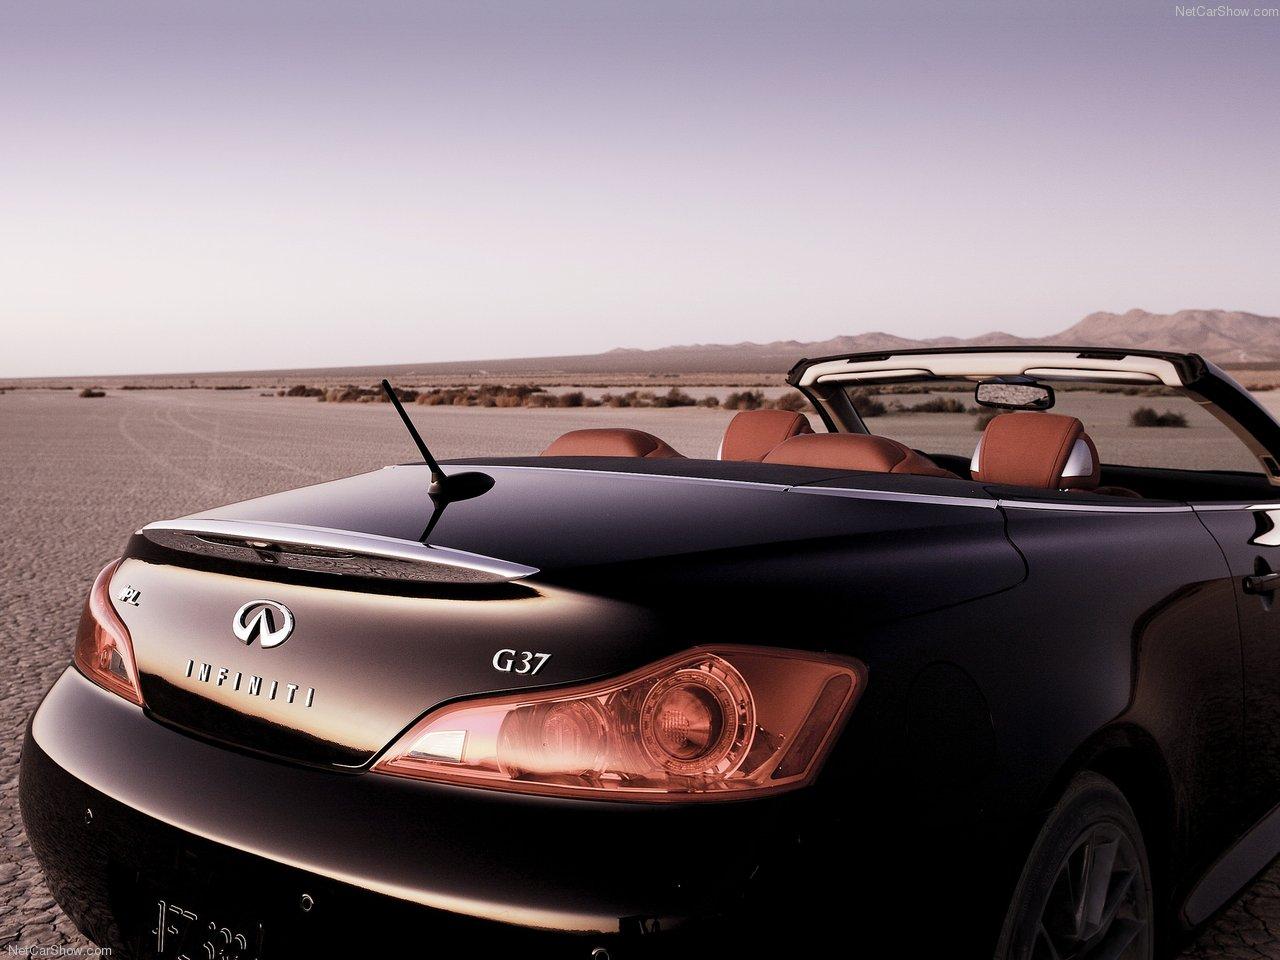 Infiniti Q60, G37, luksusowe auta, klasa premium, convertible, cabrio, fotki, japońskie samochody